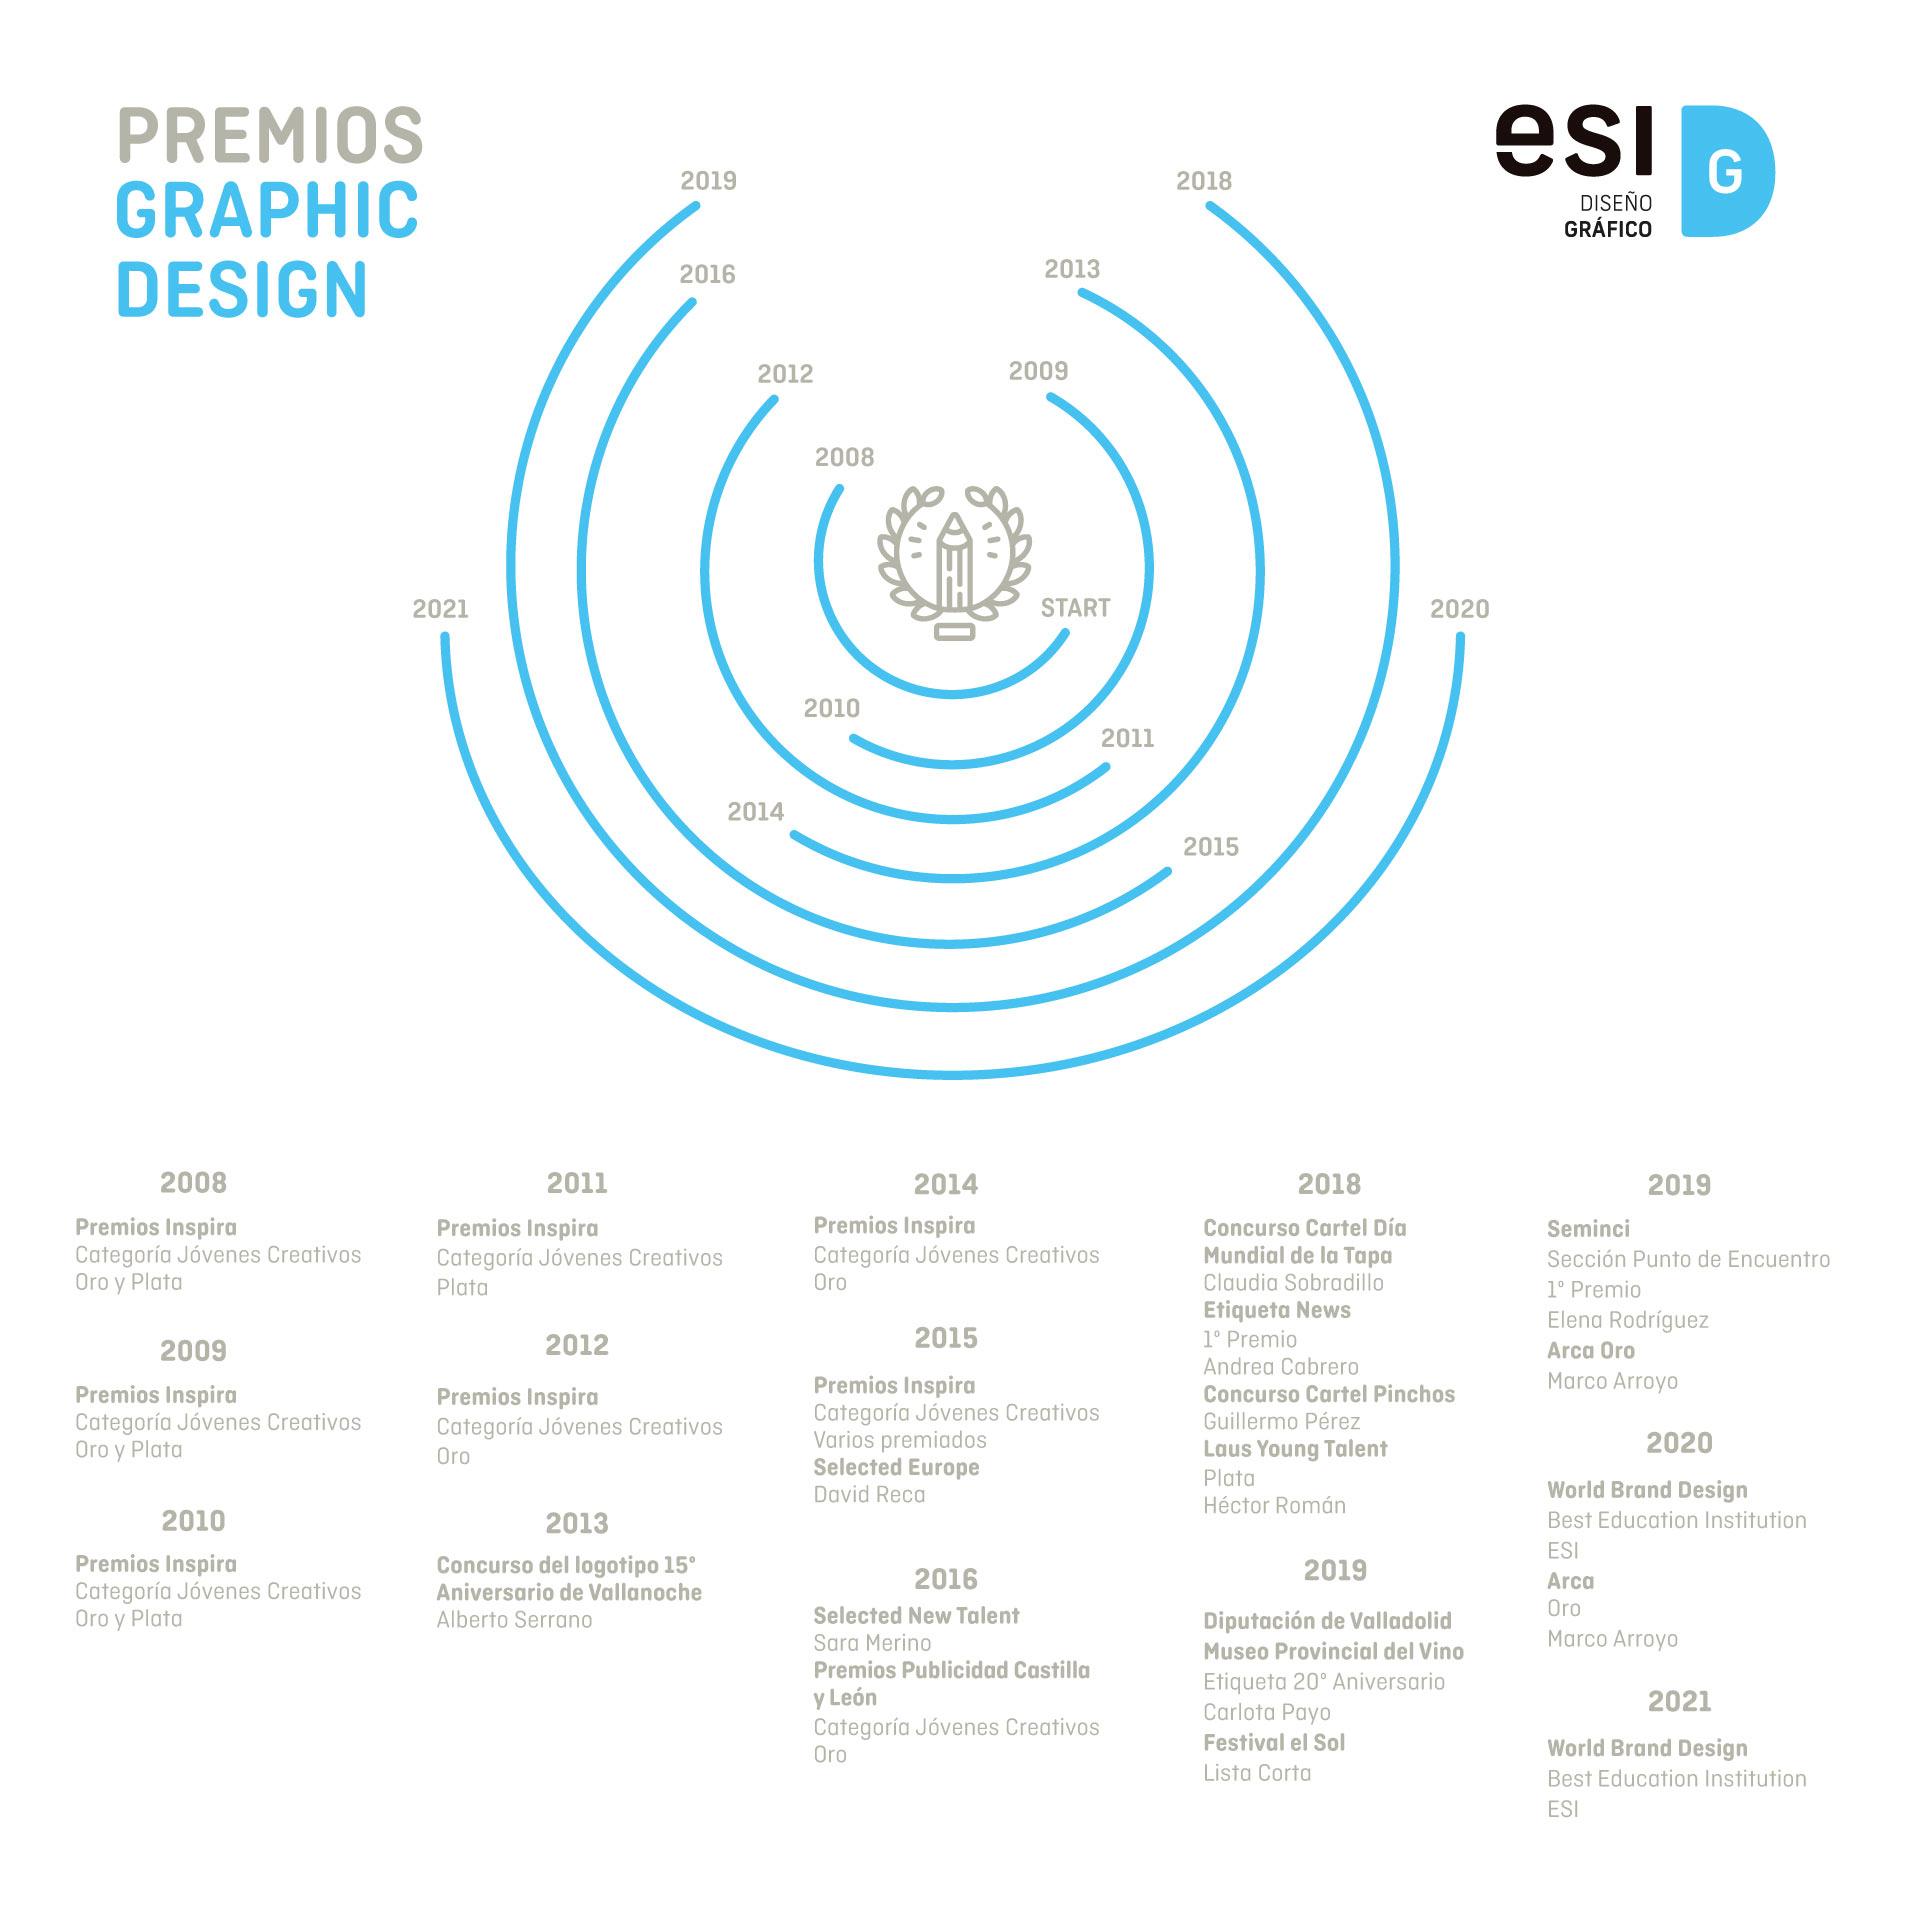 Premios Graphic Design Detalle